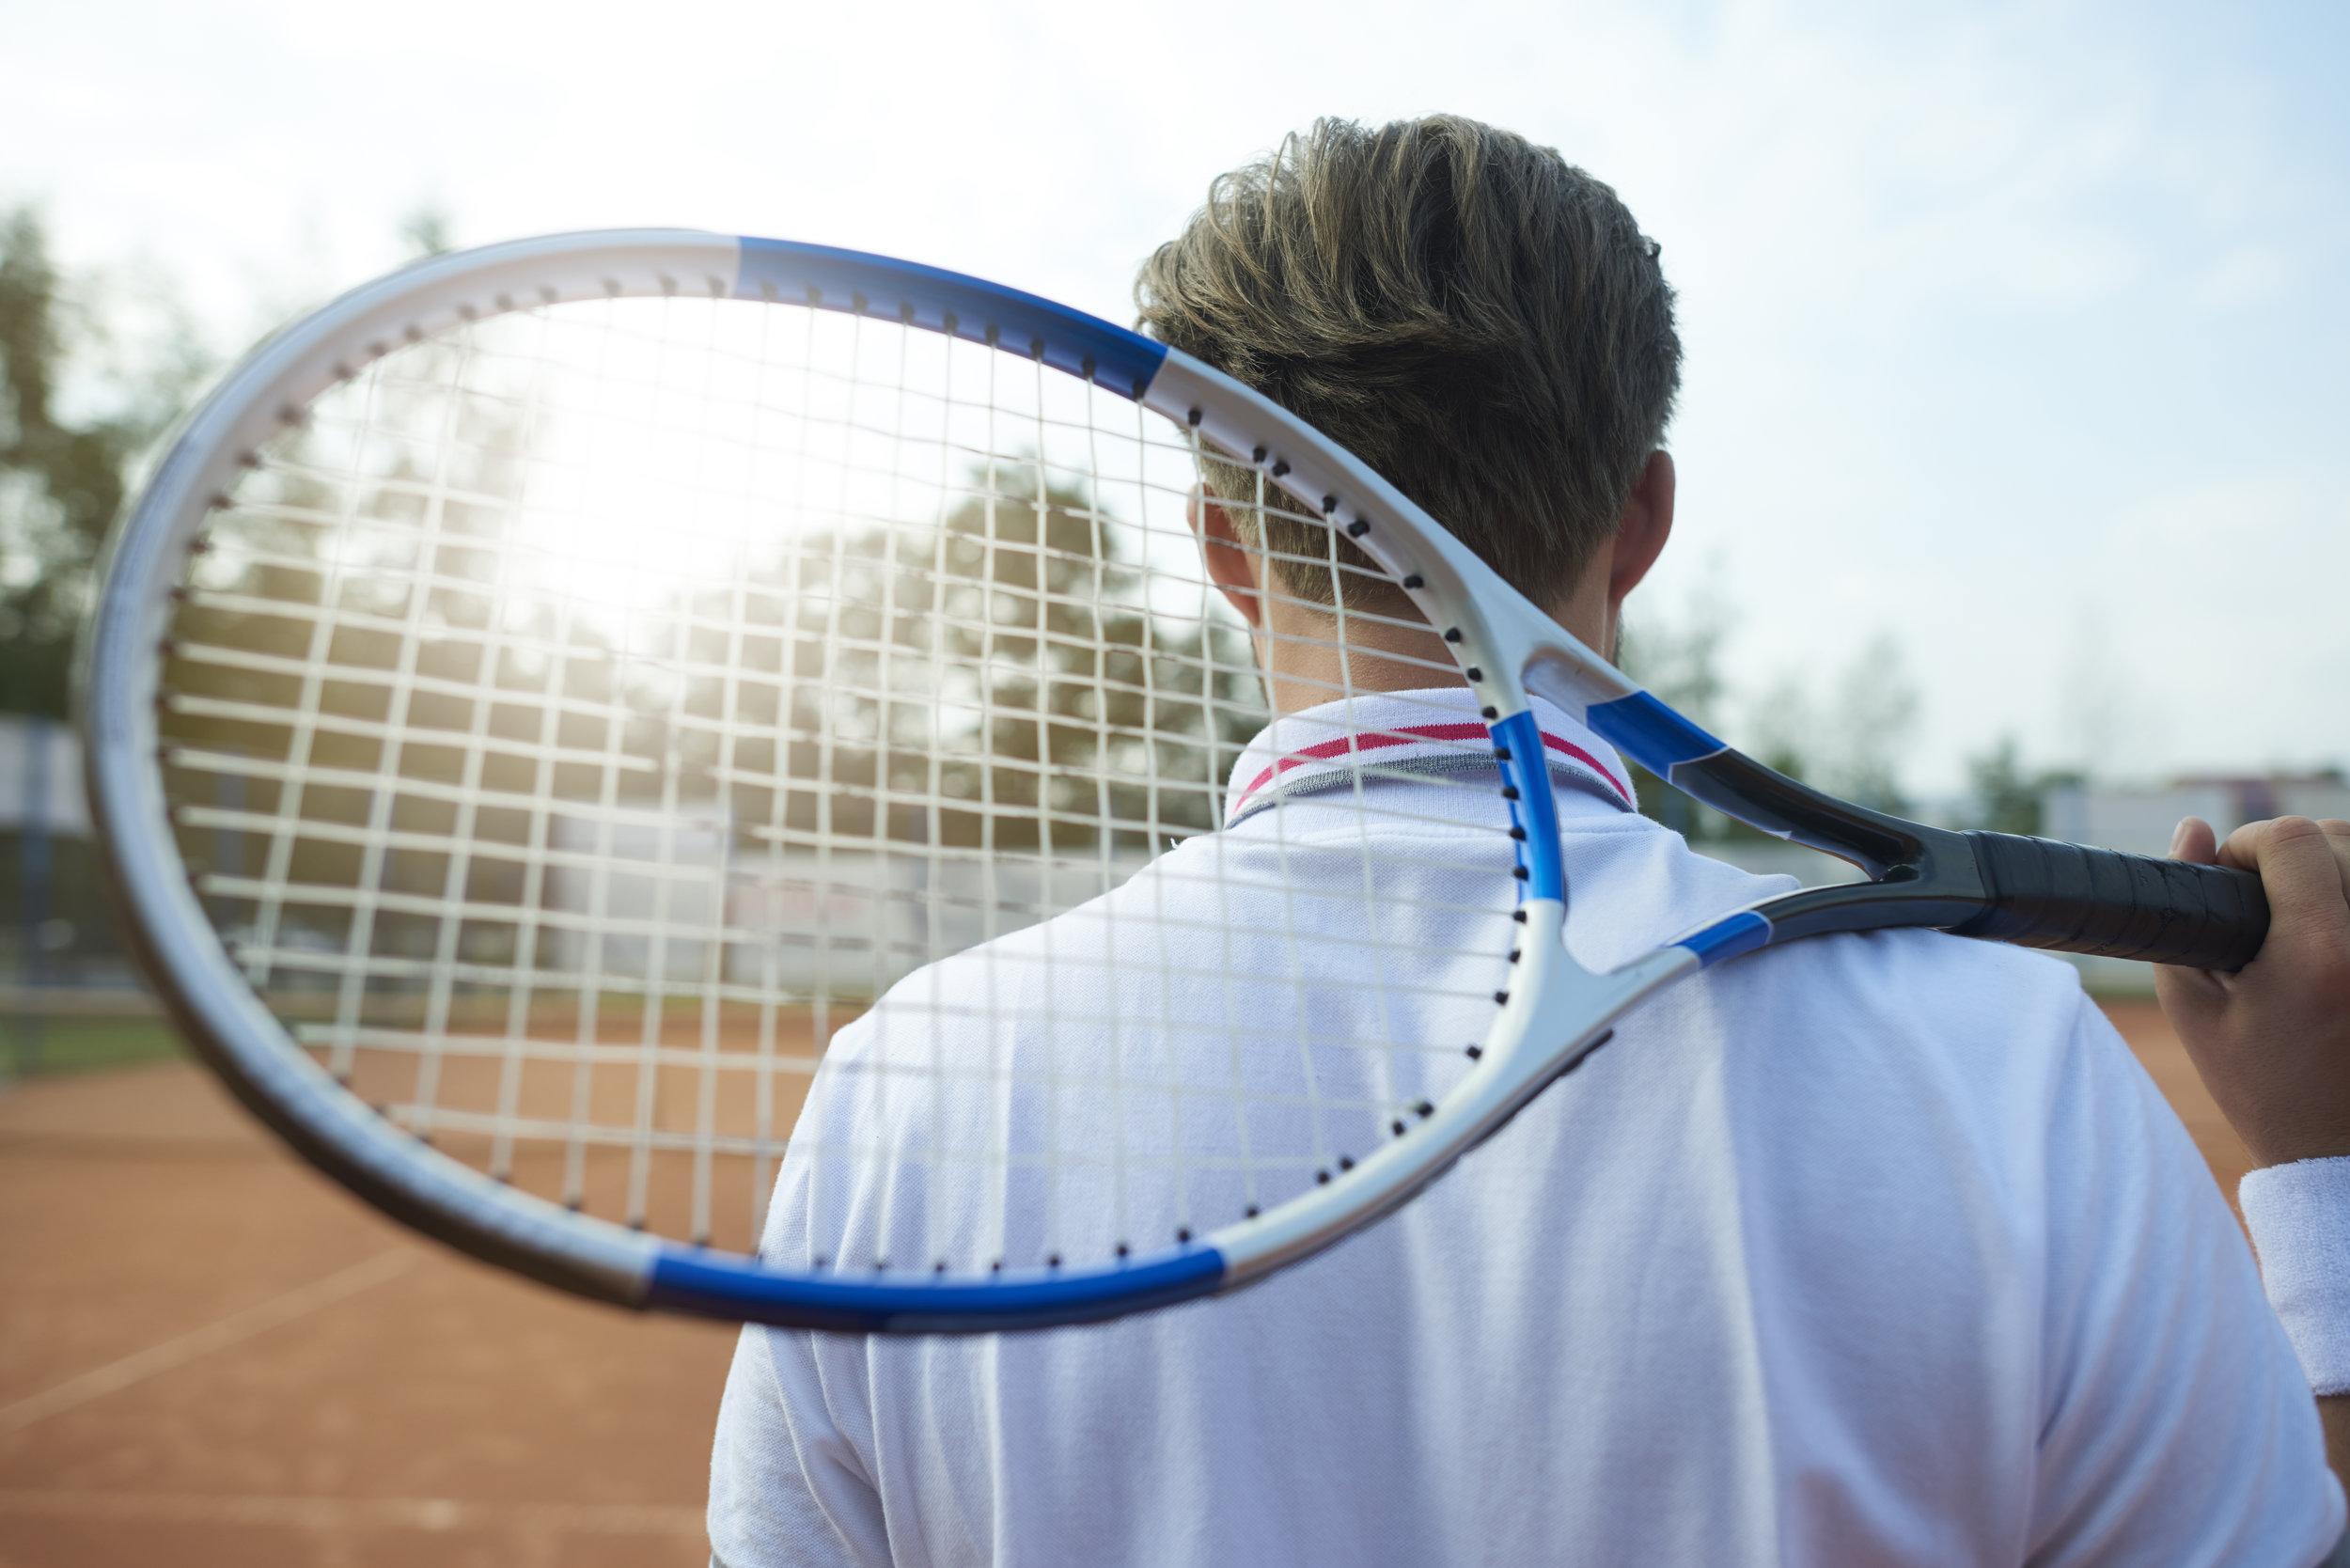 storyblocks-man-is-holding-a-tennis-racket_rPxmv-JF9M.jpg